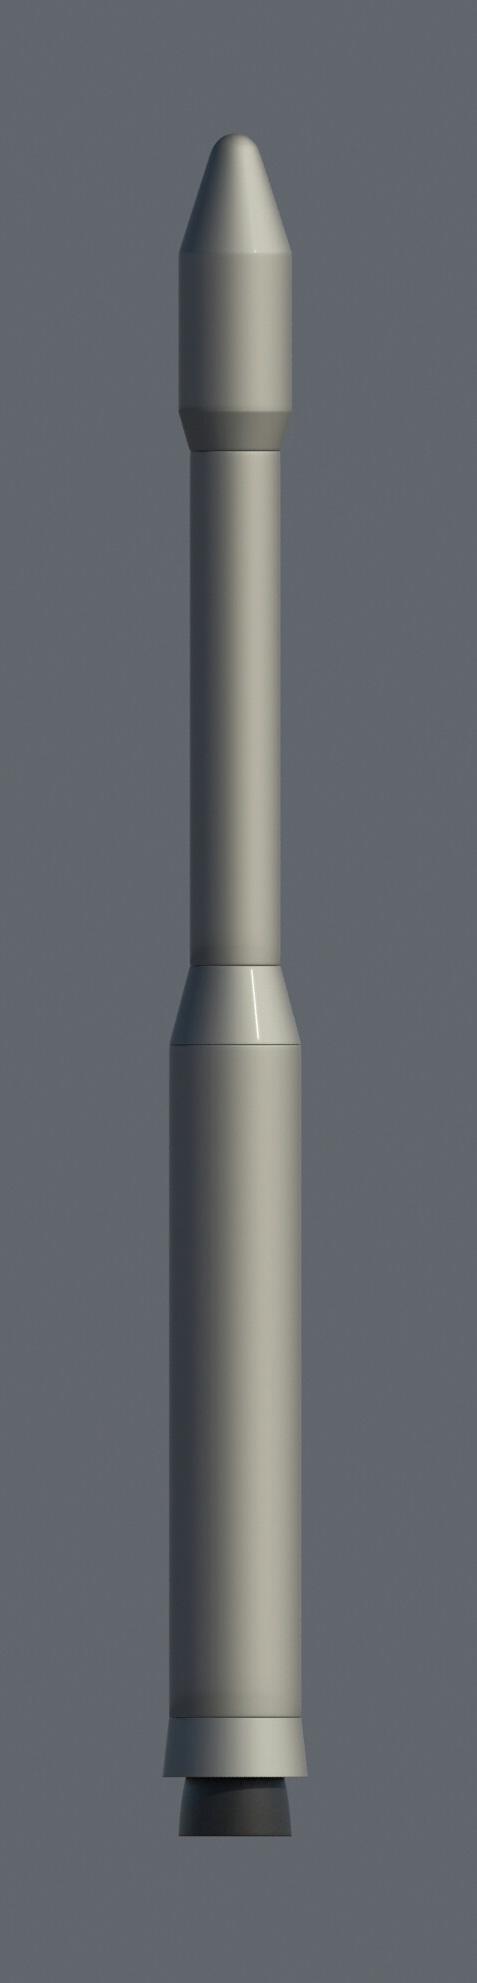 Ghaem-launcher.1500622266.jpg